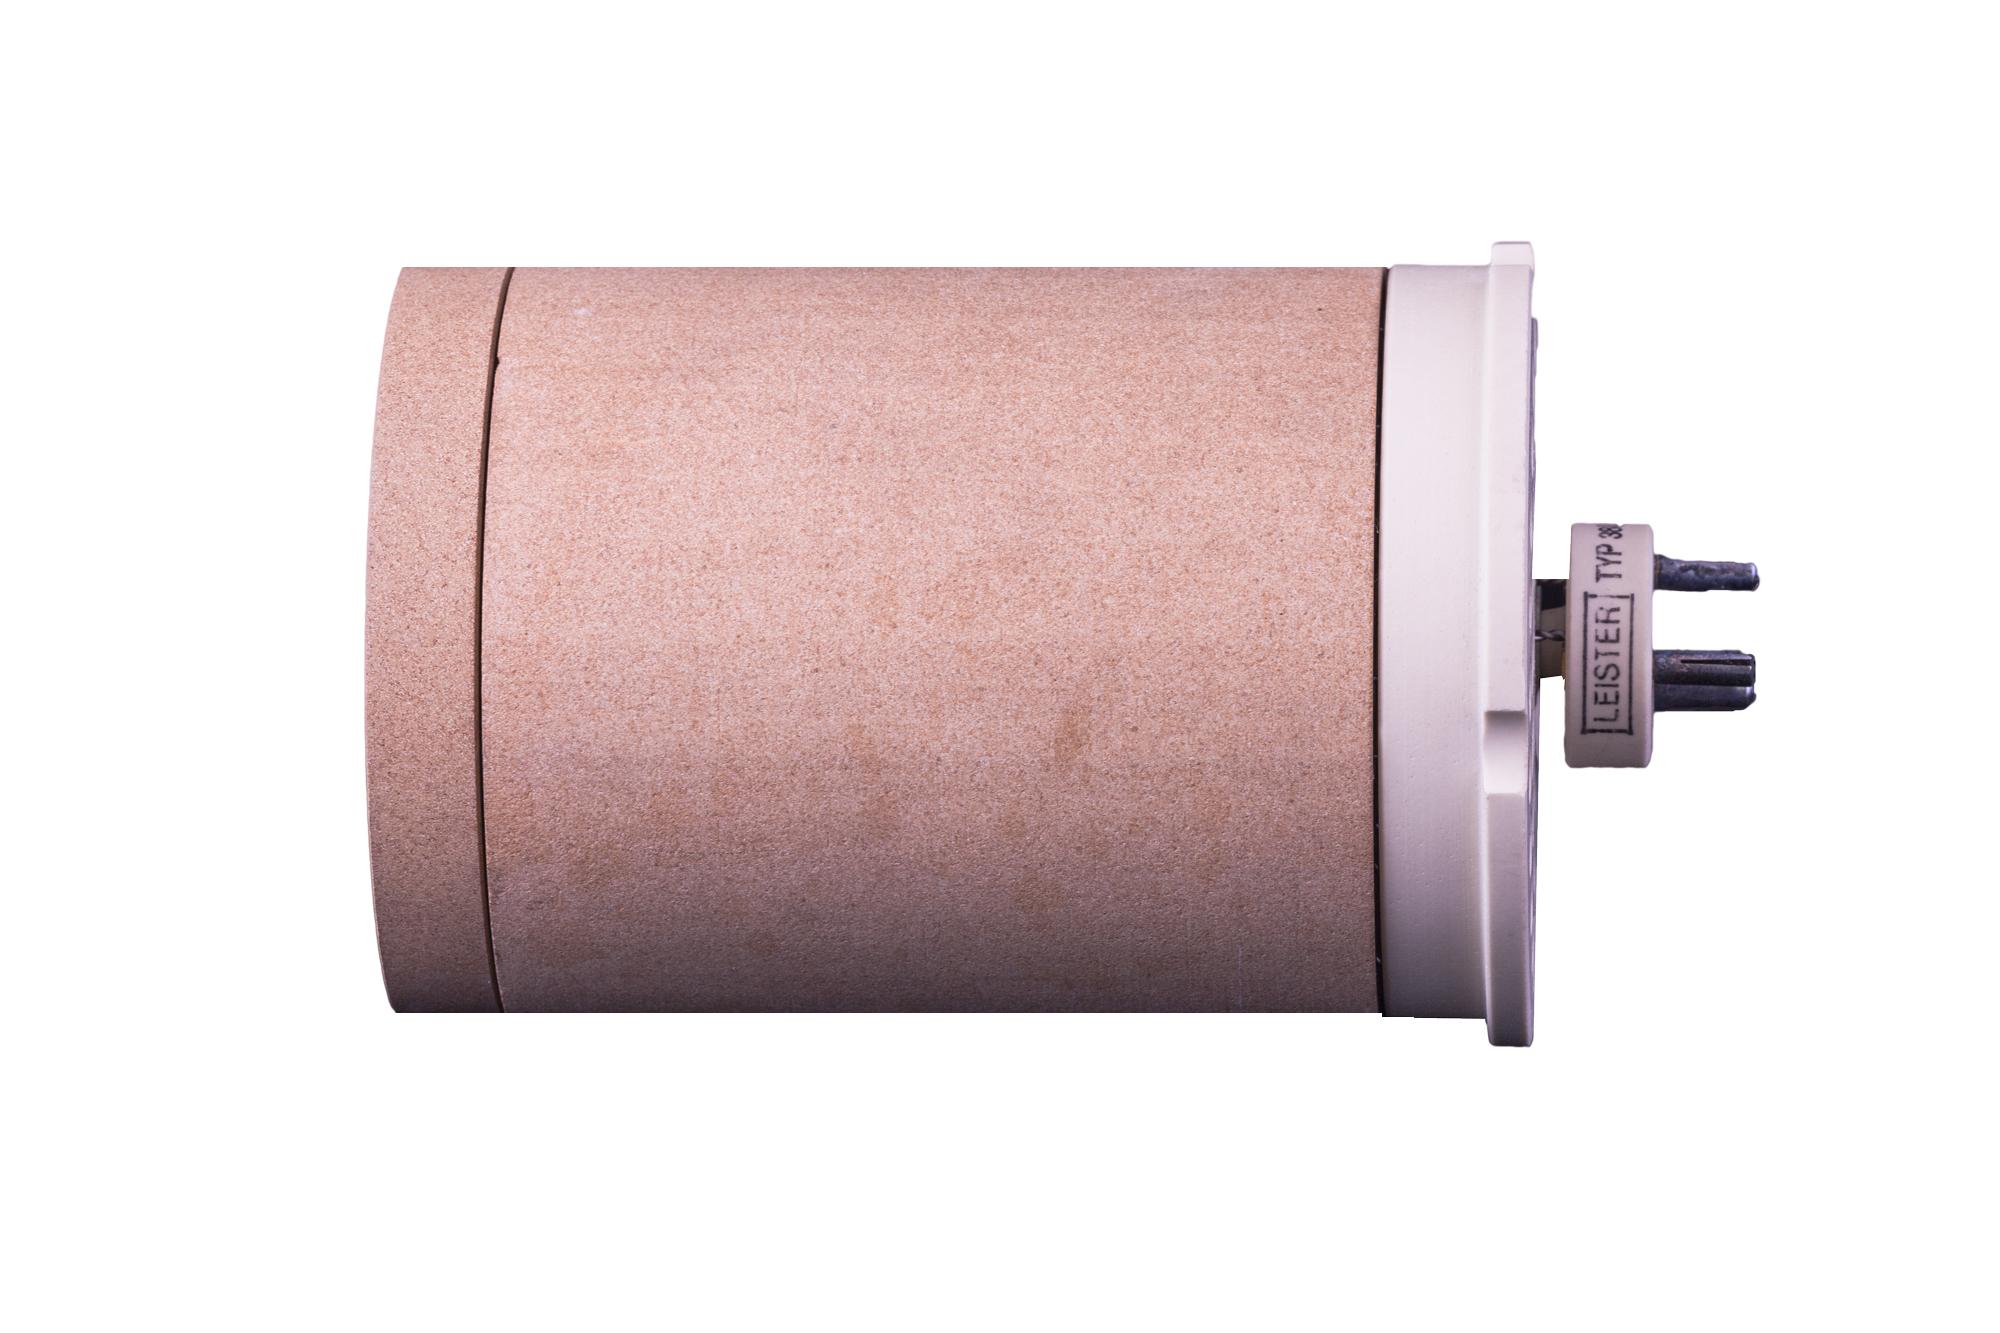 Heating Element type 85/38L3 400-480v, 11.8-17.1kW